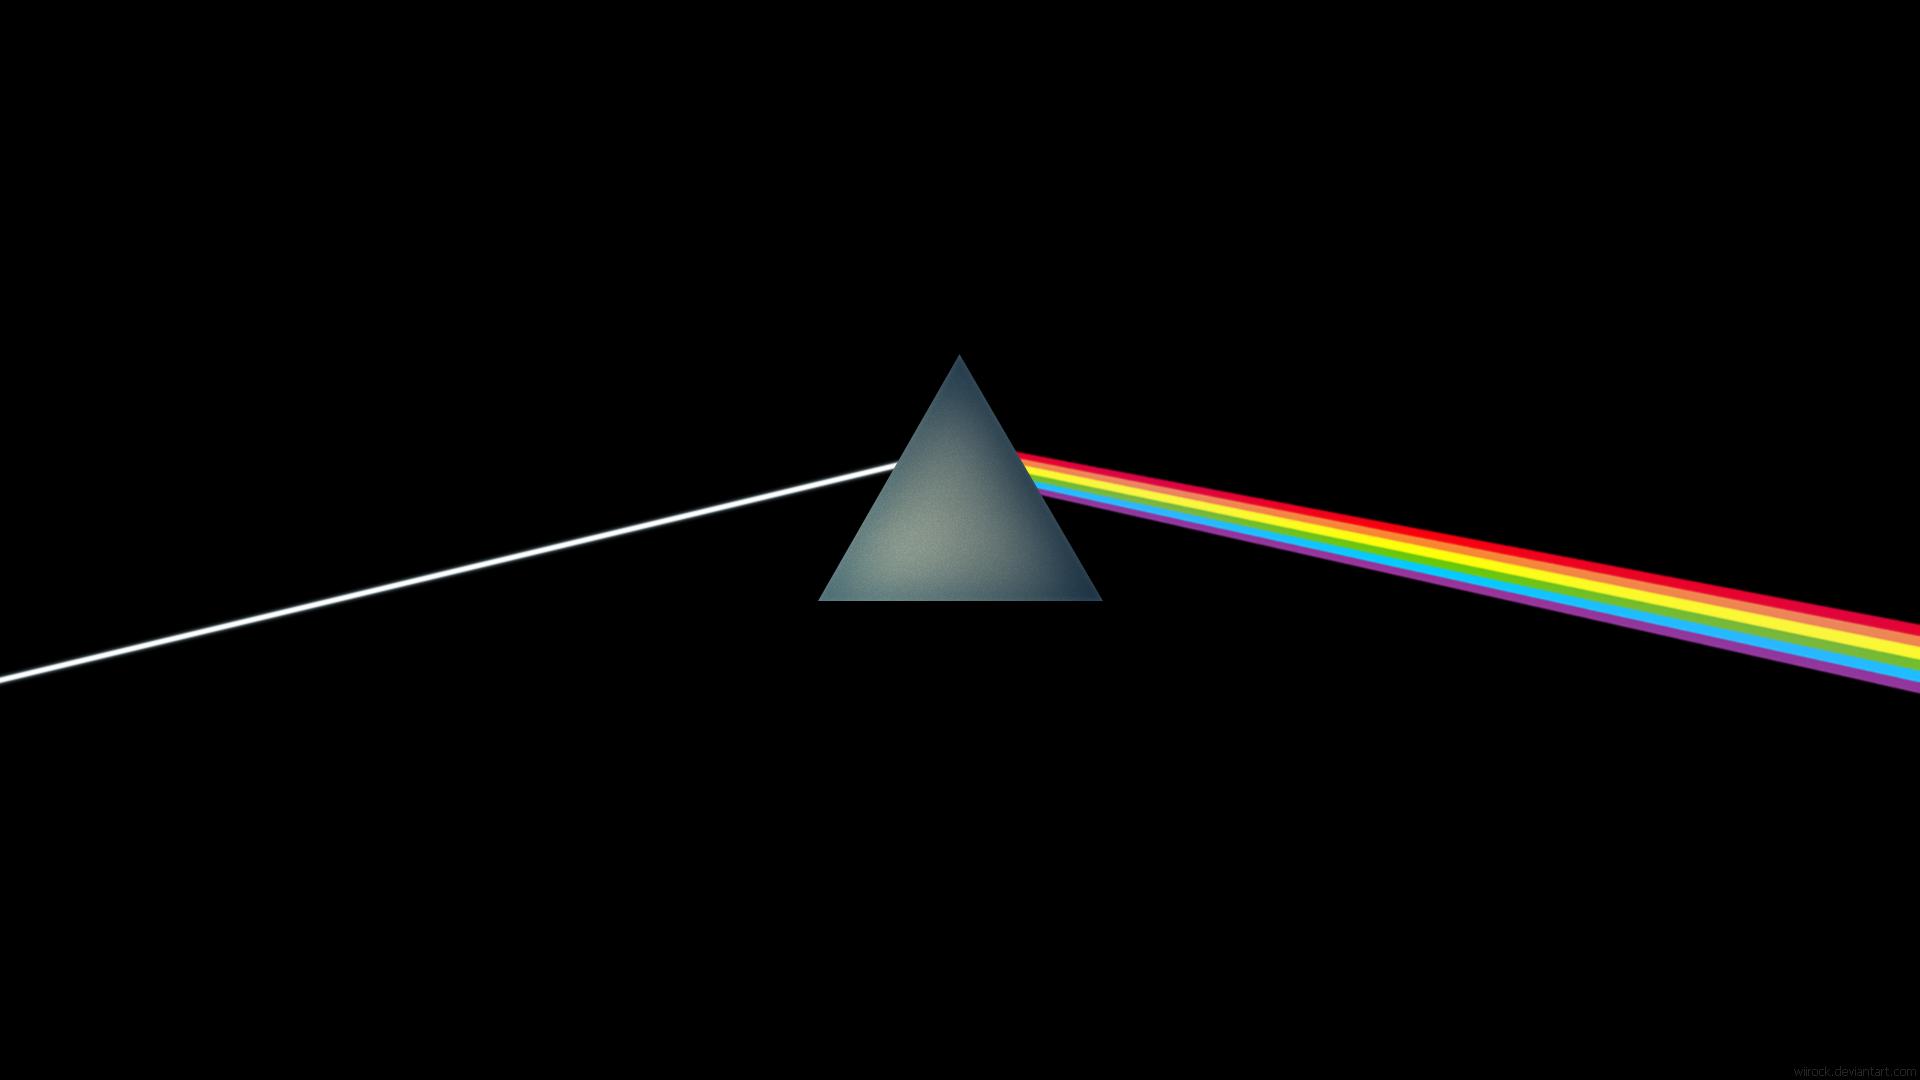 Download Pink Floyd Wallpaper 1920x1080 Wallpoper 393054 1920x1080